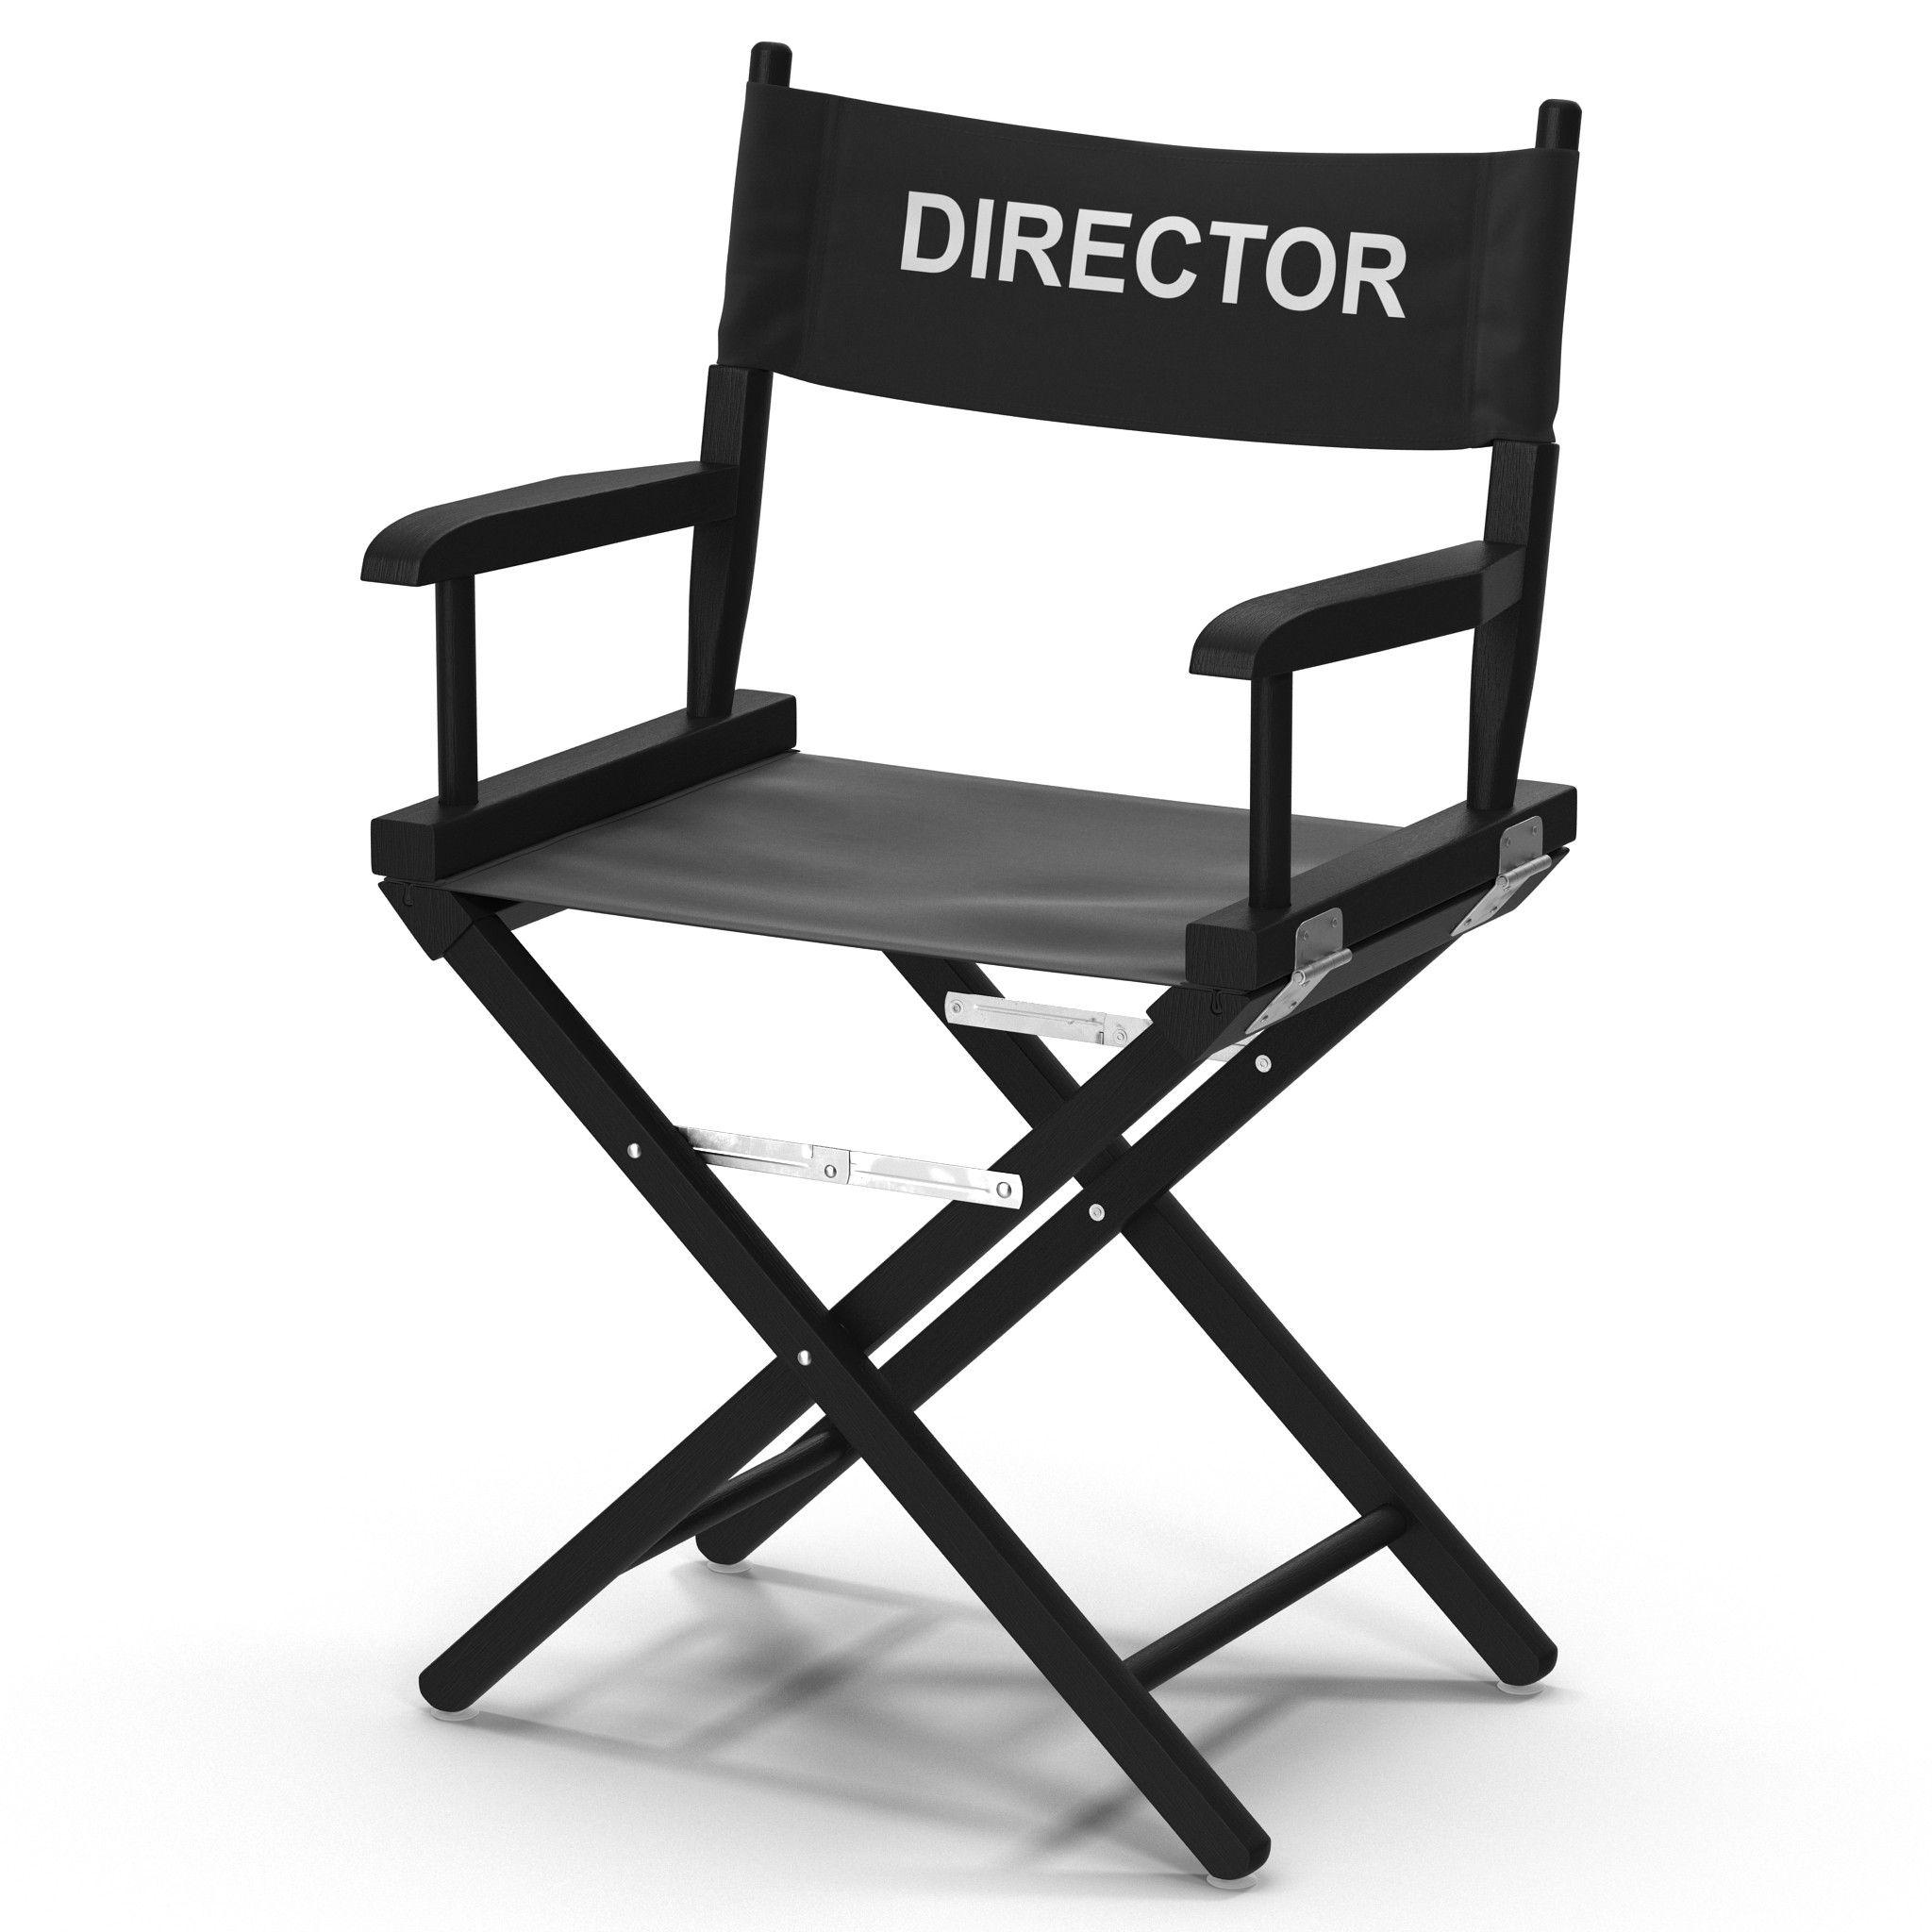 3D Director Chair Black Model 3D Model 3D Modeling